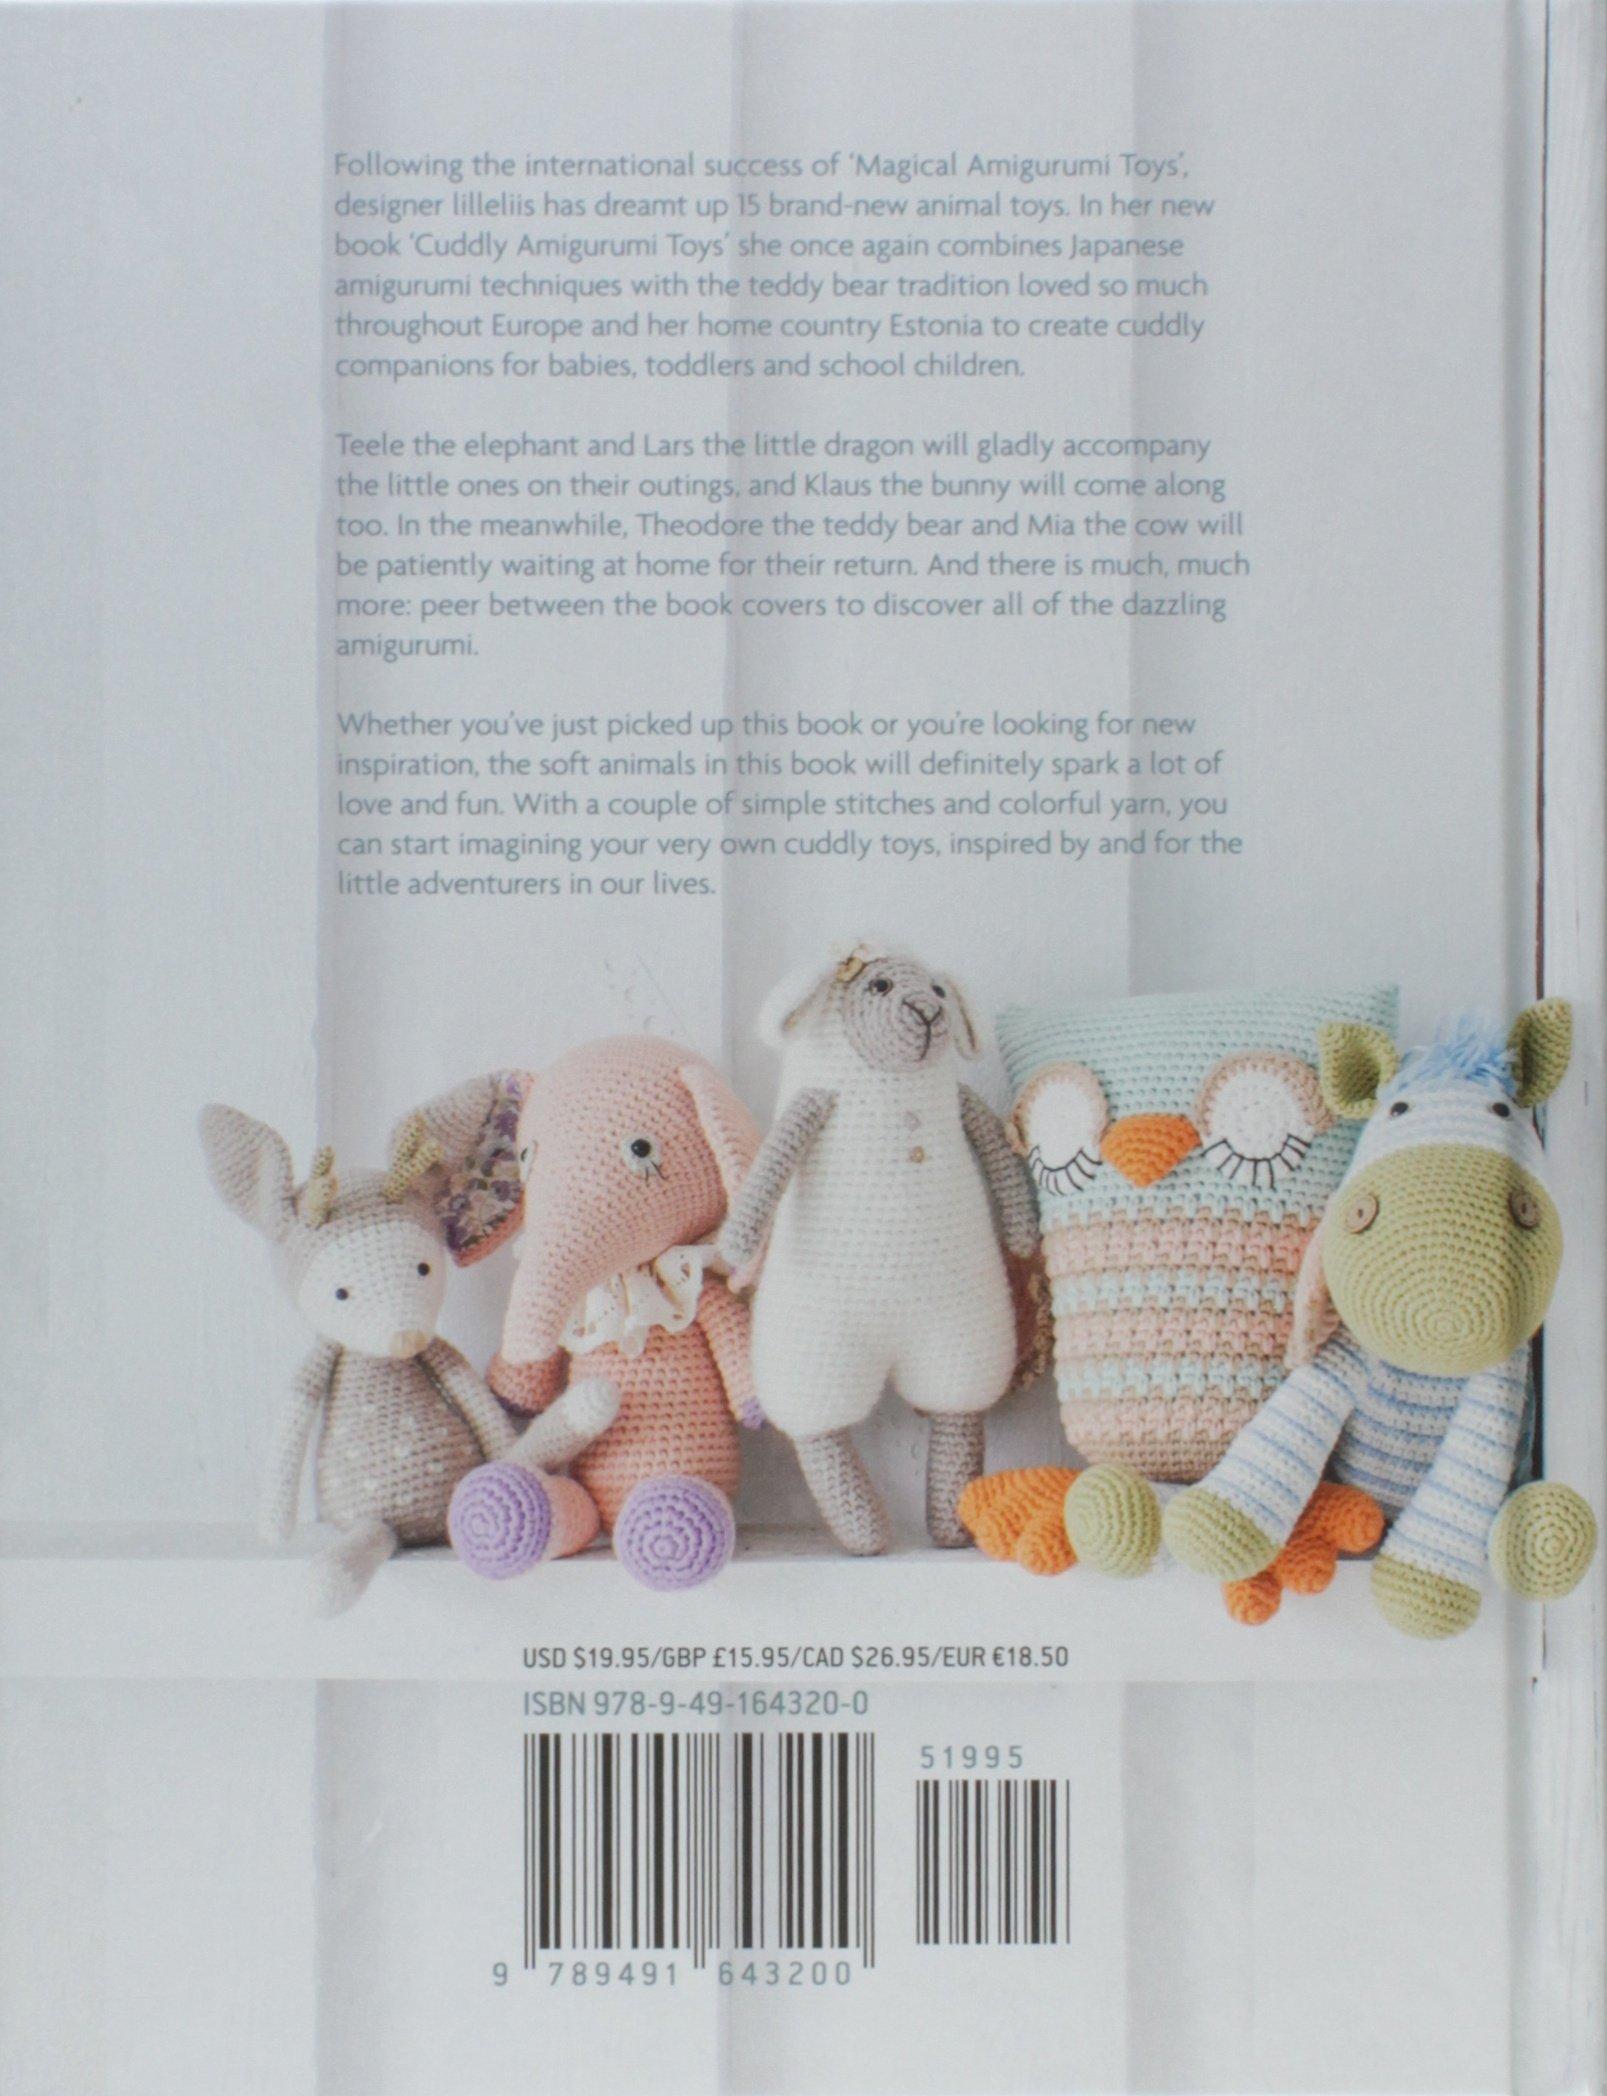 Cuddly Amigurumi Toys: 15 New Crochet Projects by Lilleliis: Amazon ...